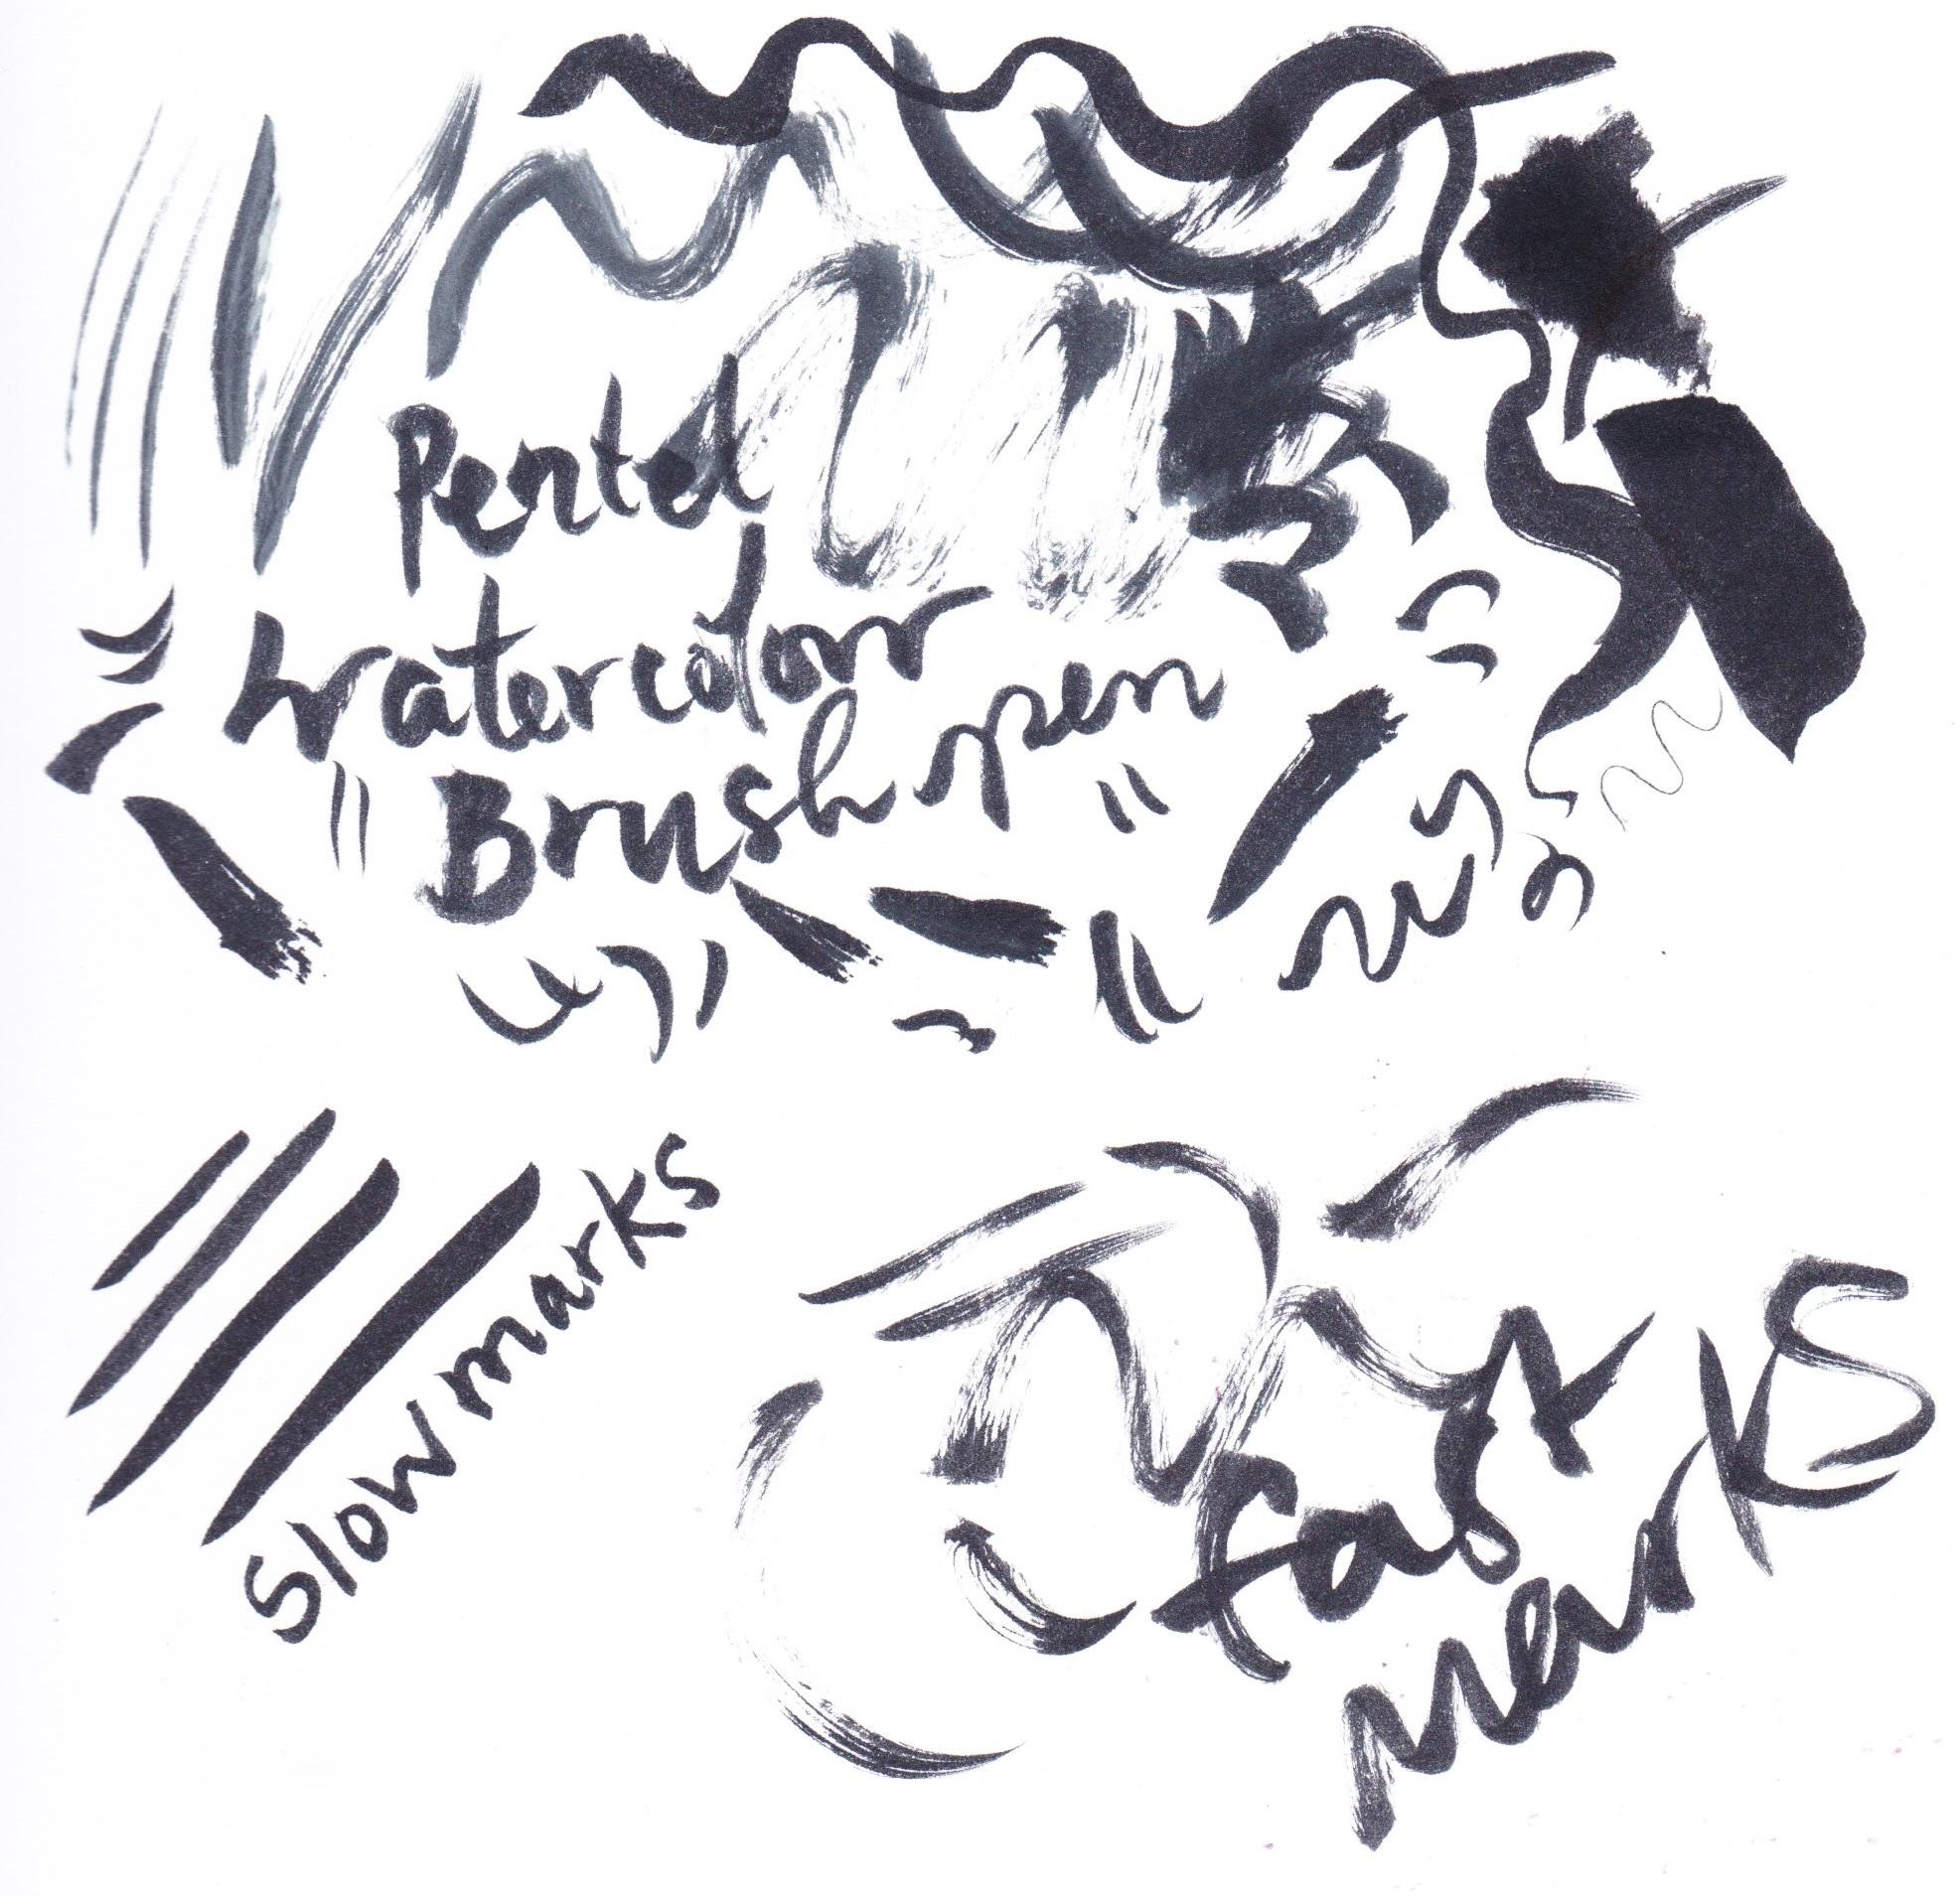 Pentel Watercolour Brush Pen on Bristol board